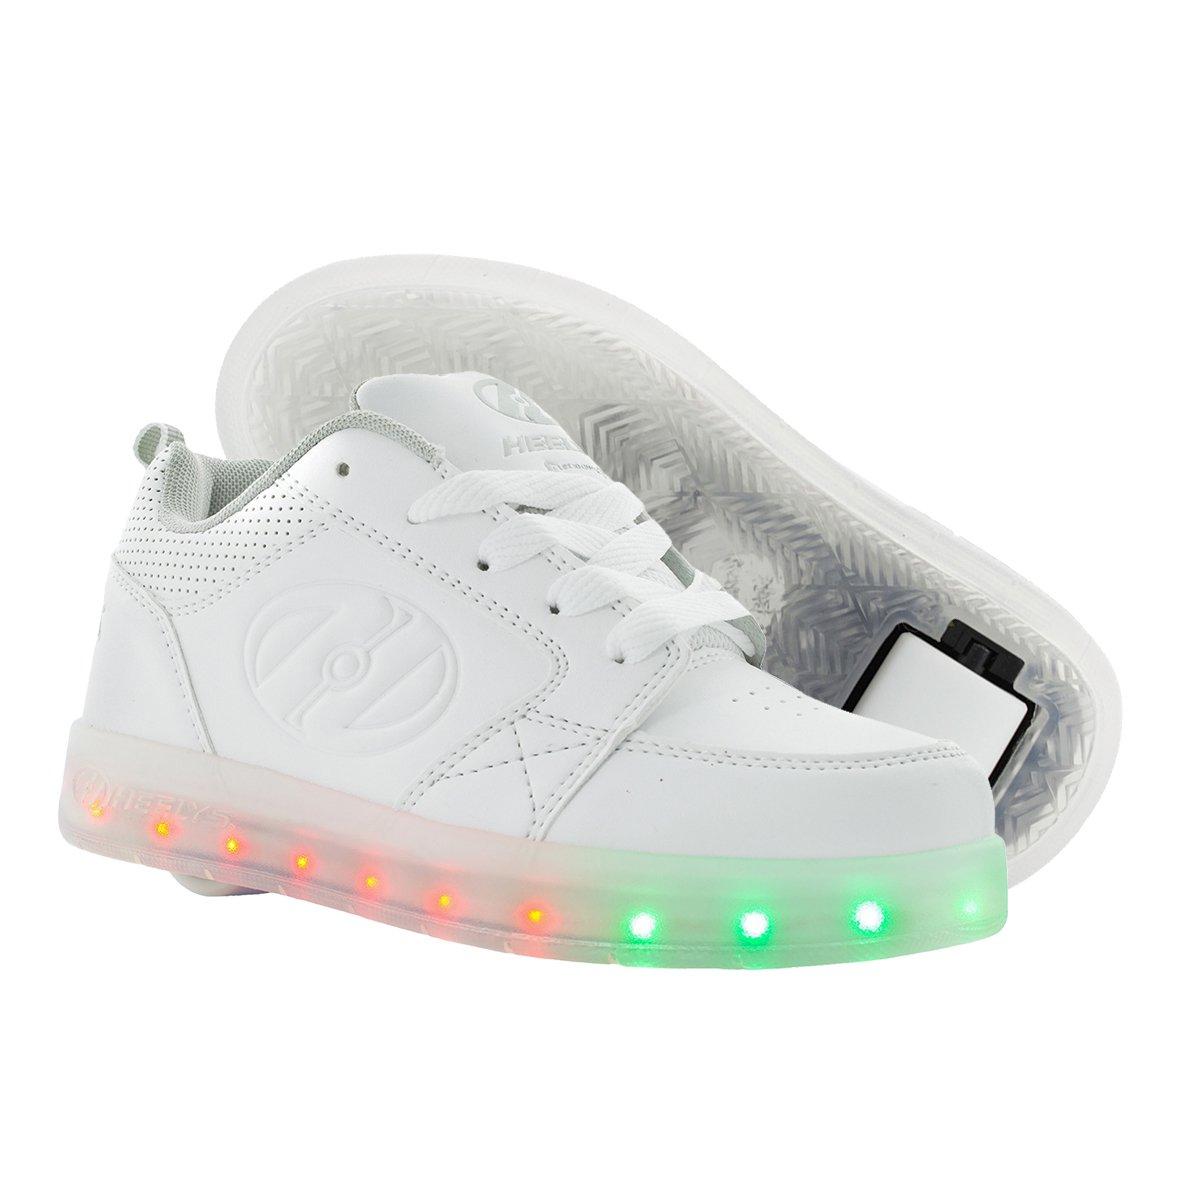 Triple White Heelys Womens Premium 1 LO Running shoes